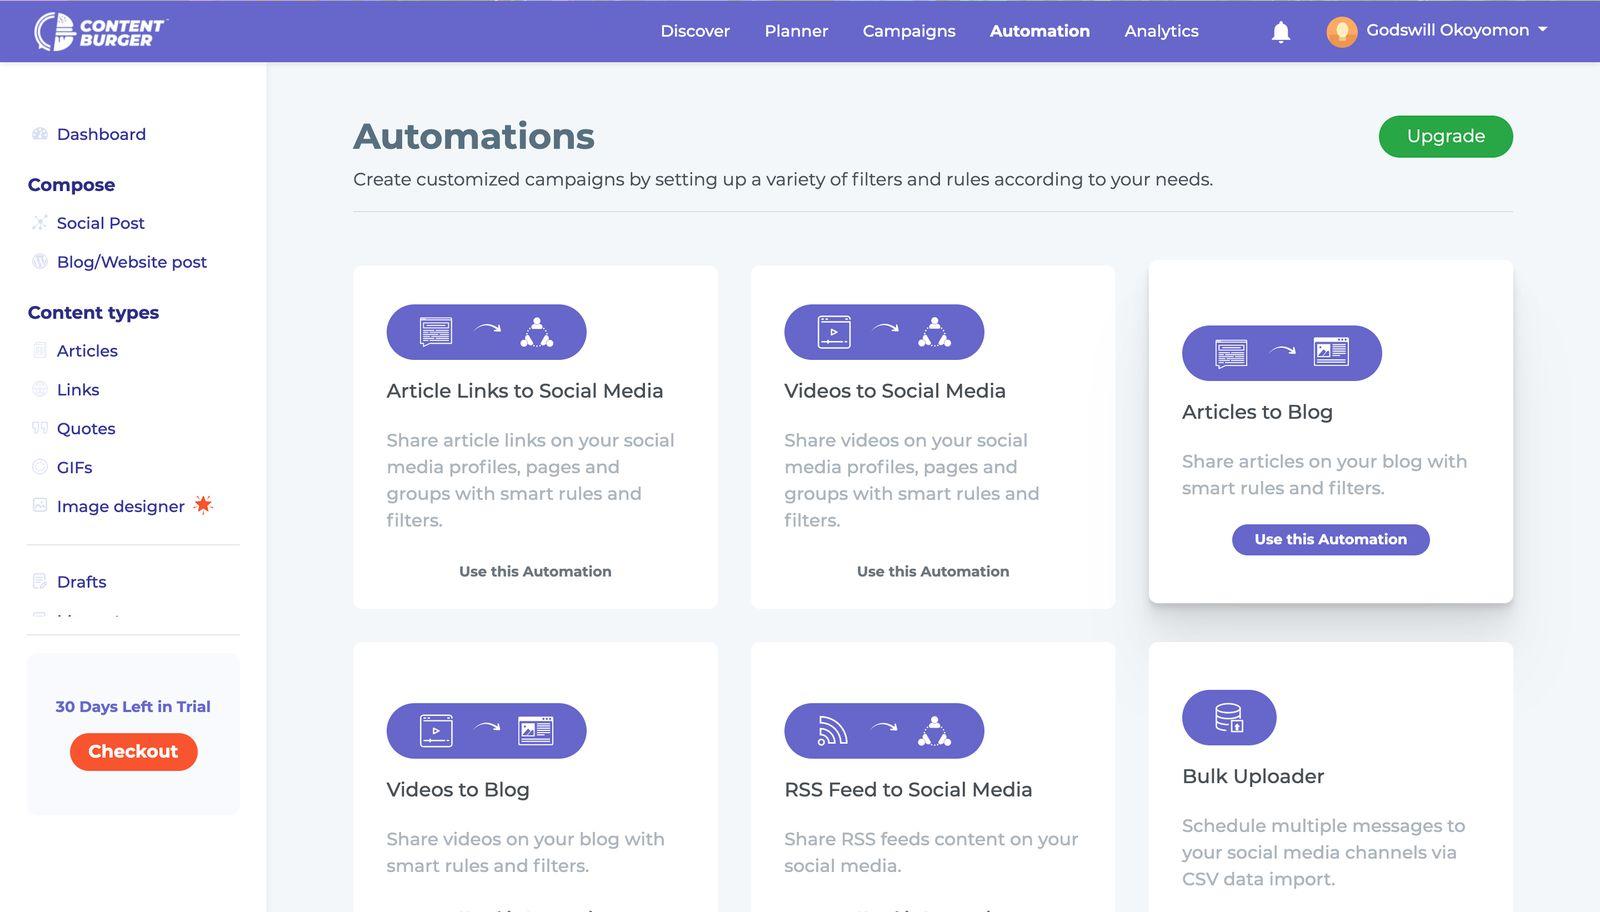 ContentBurger-Automation-Recipes